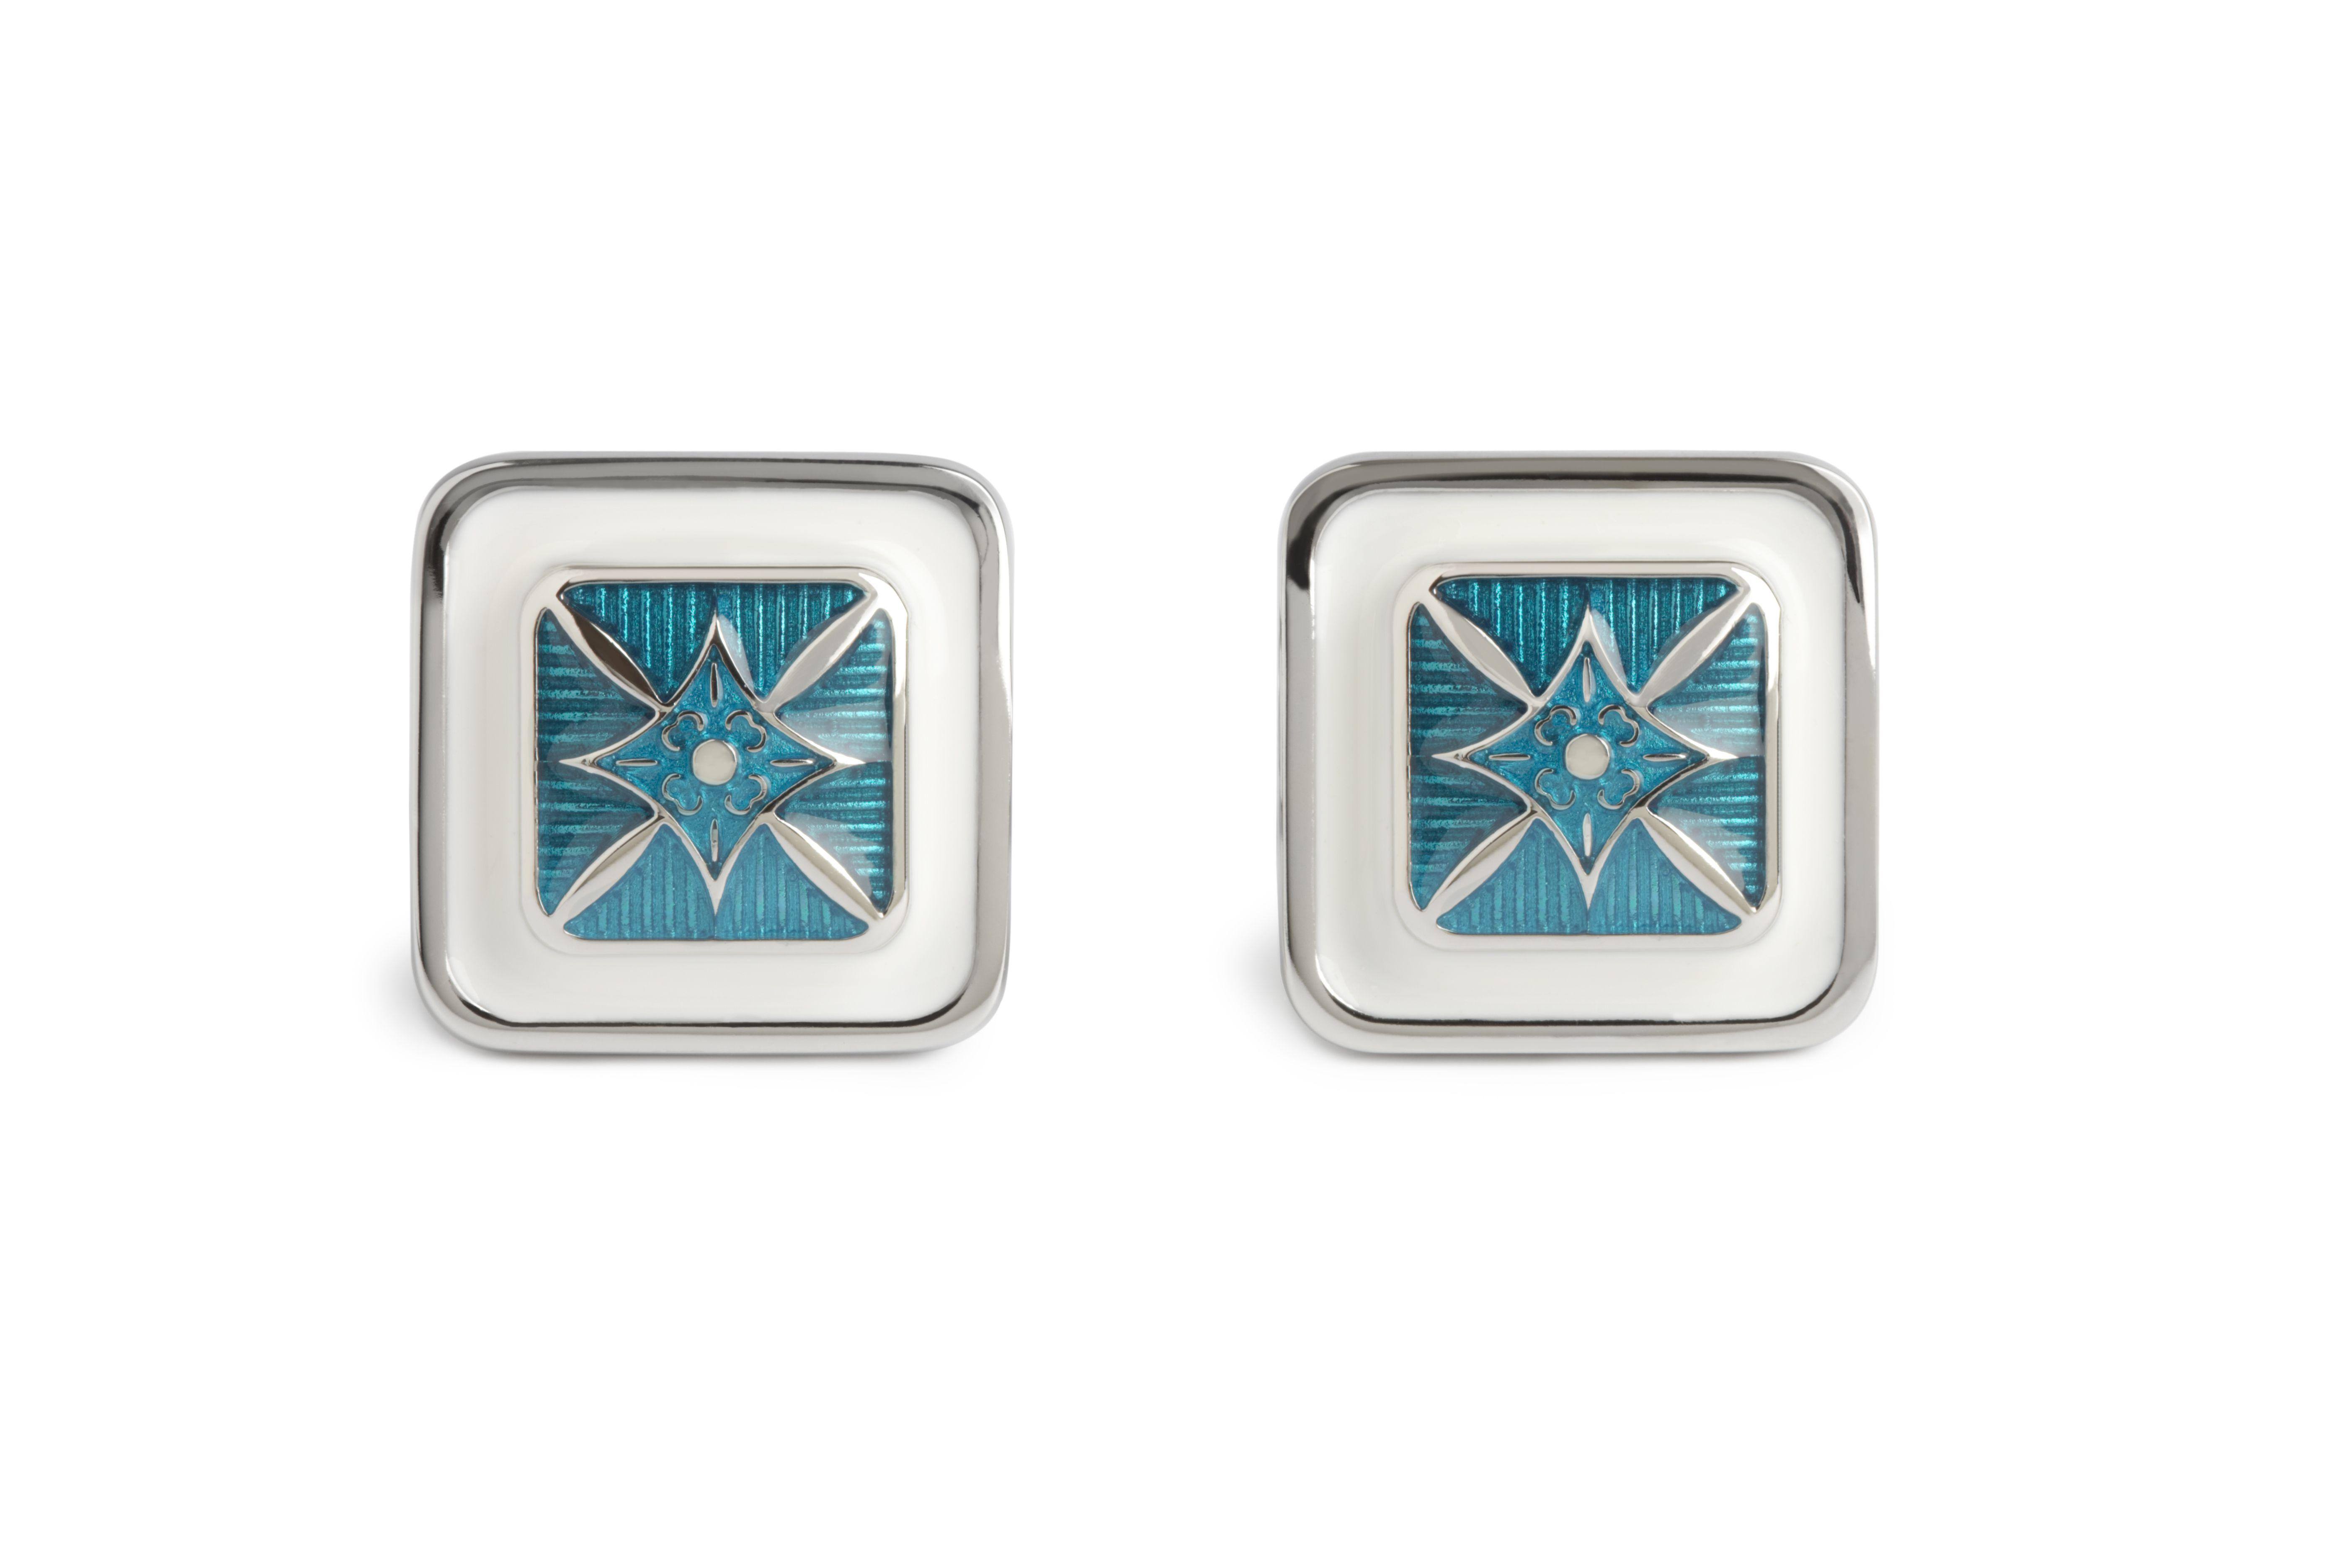 Blue Star Square Cufflinks